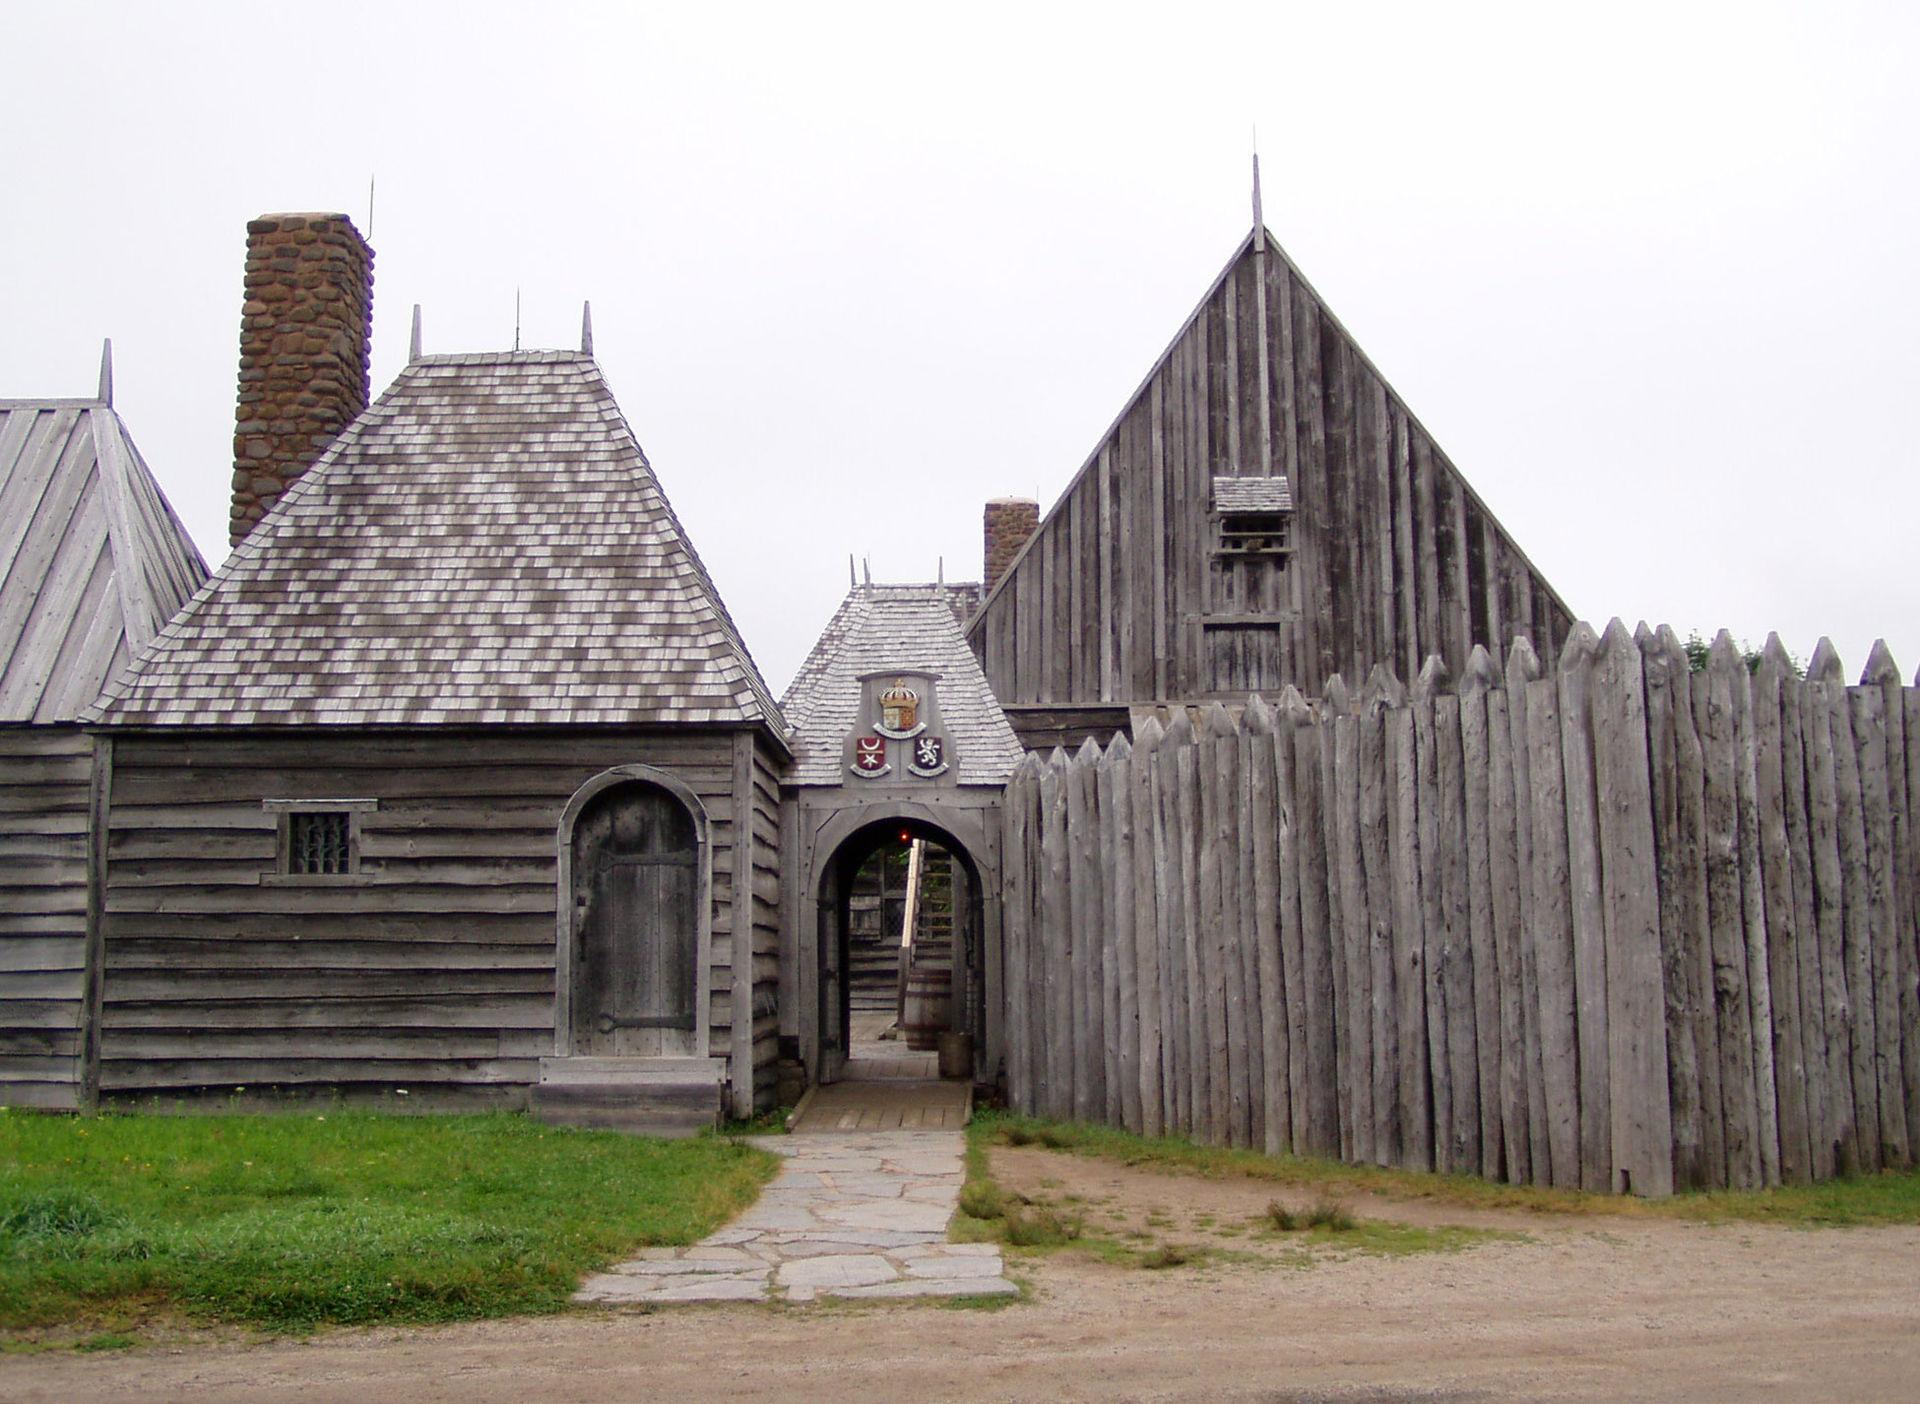 port royal national historic site wikipedia. Black Bedroom Furniture Sets. Home Design Ideas